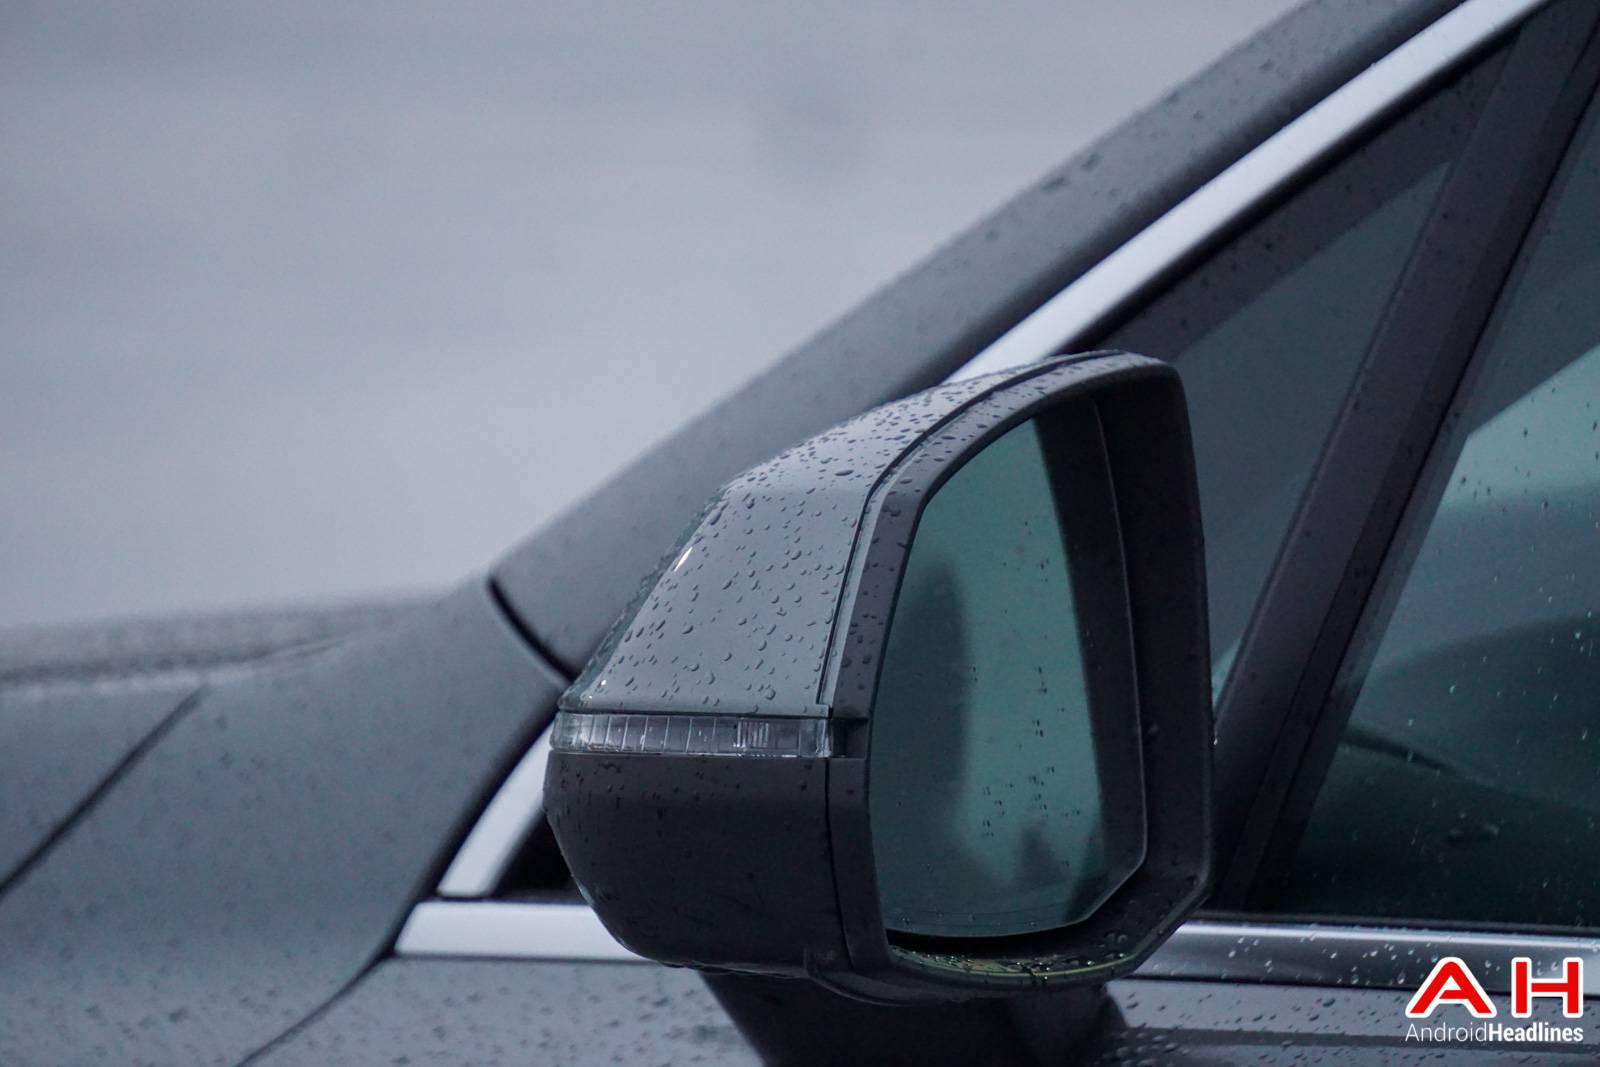 2017 Audi Q7 Review AH 3 6